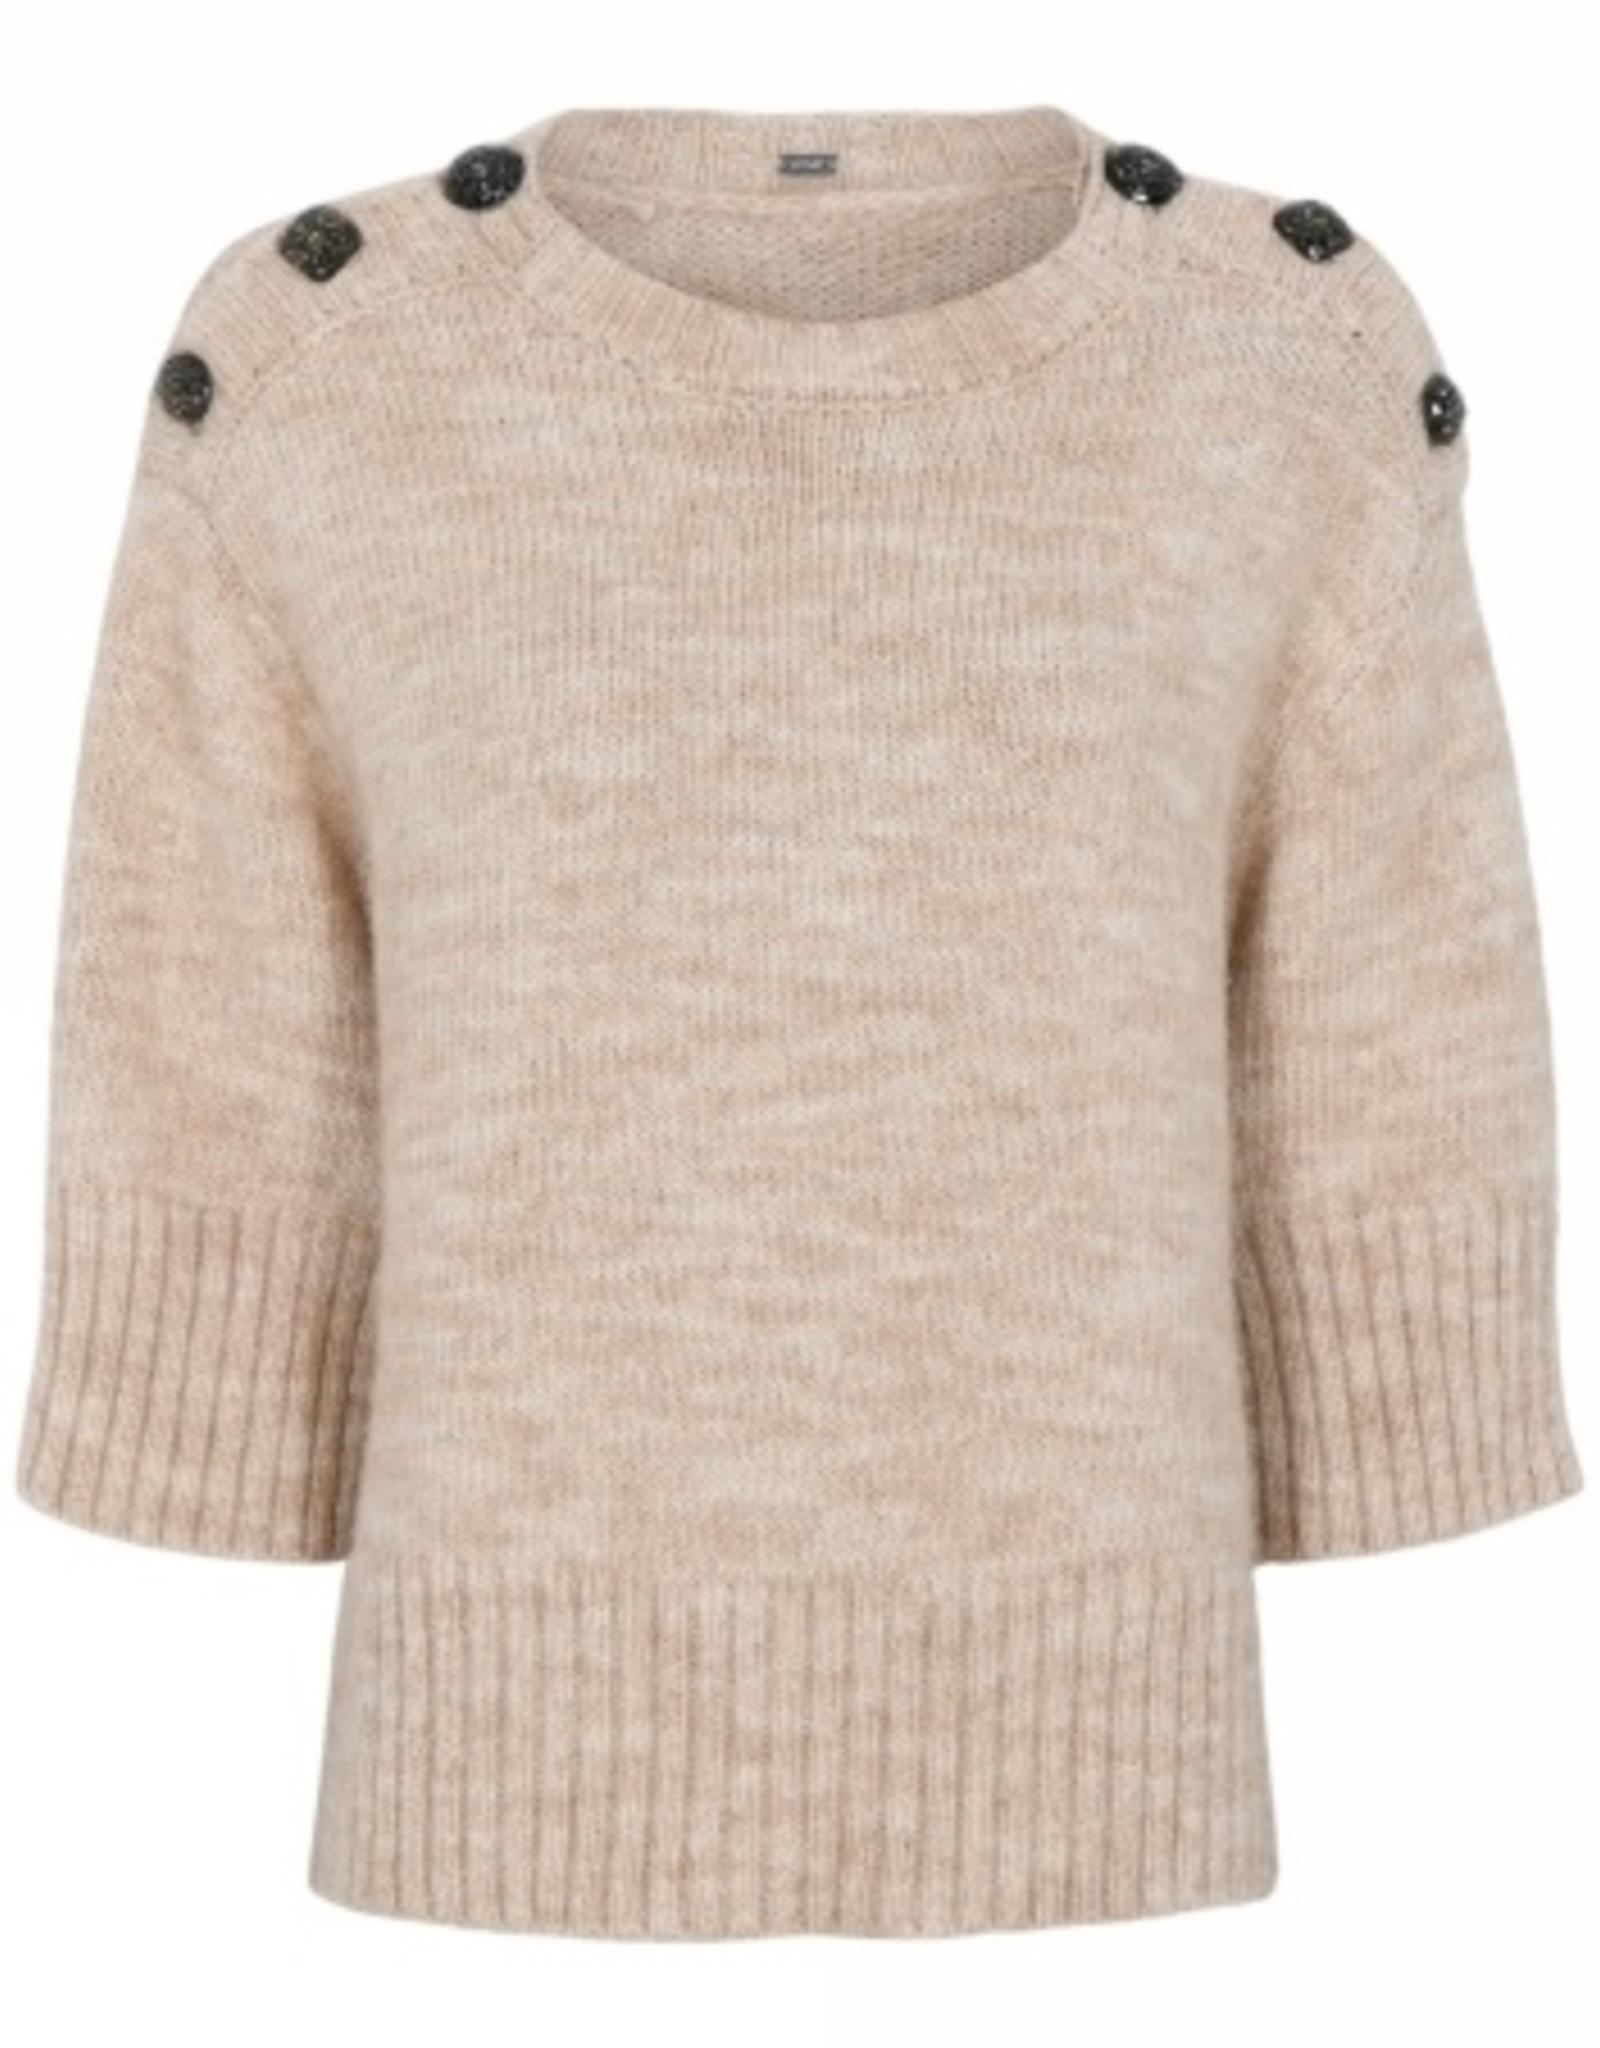 Charlee knit